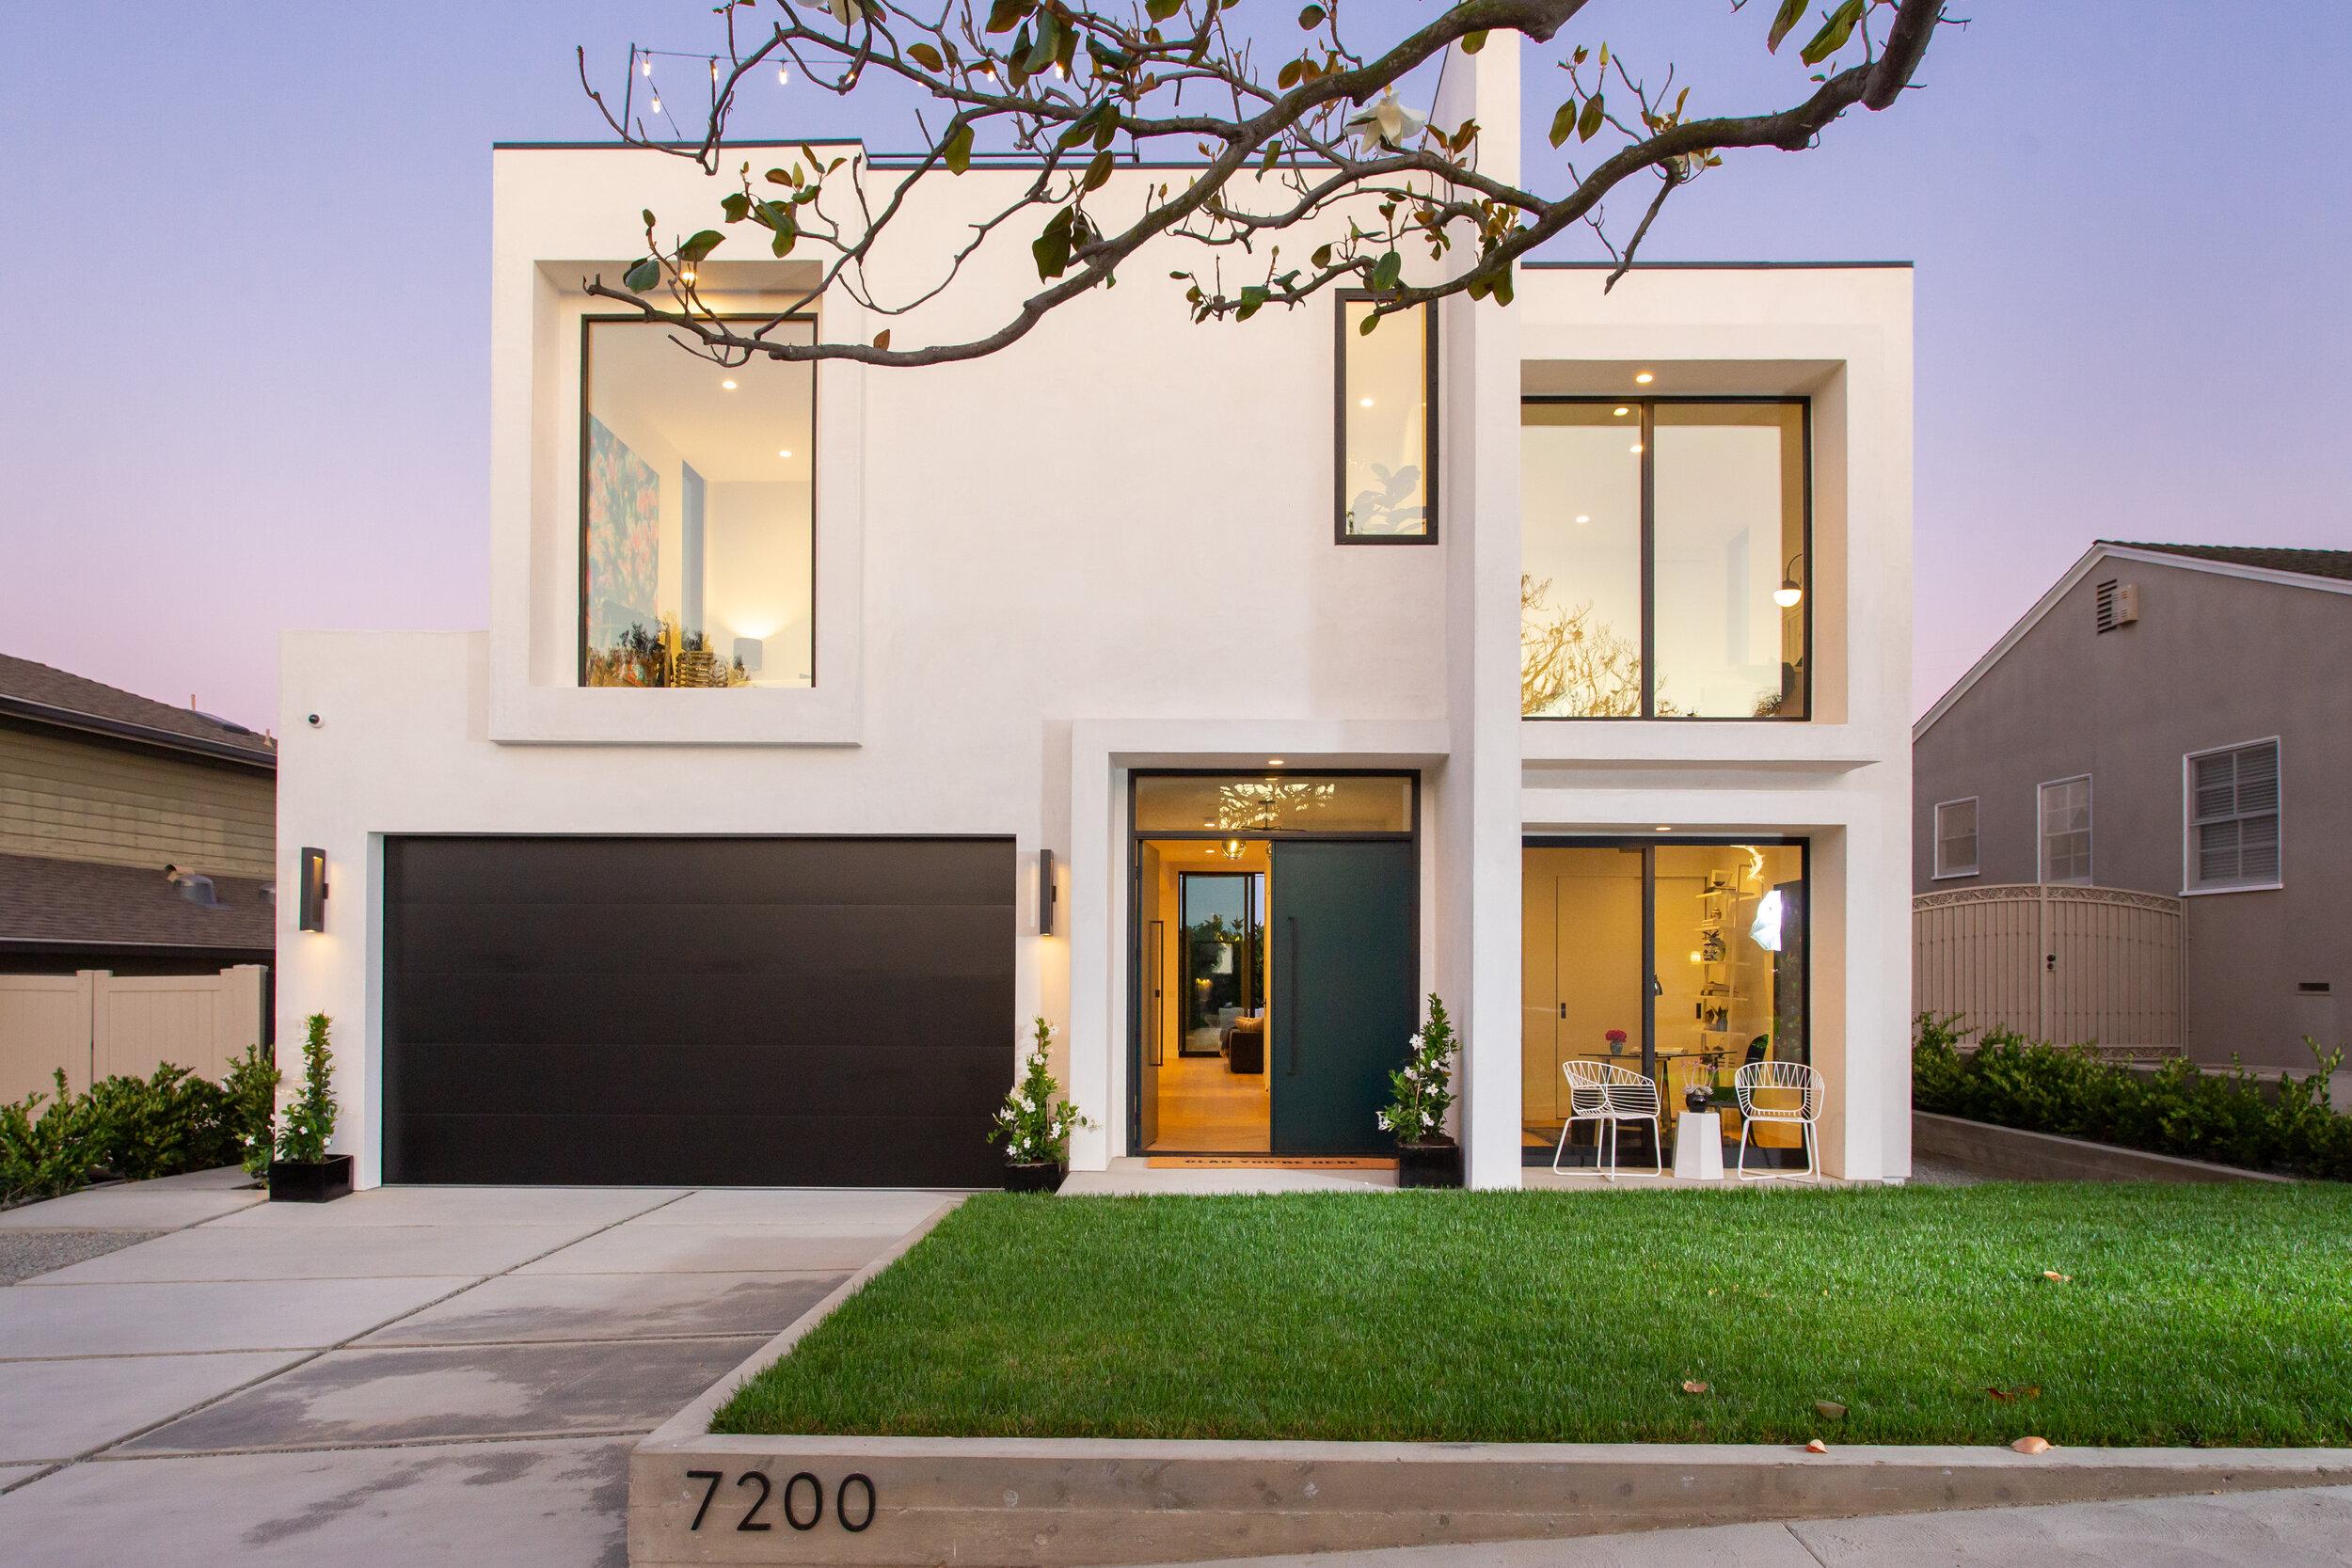 7200 Kentwood Ave, LA